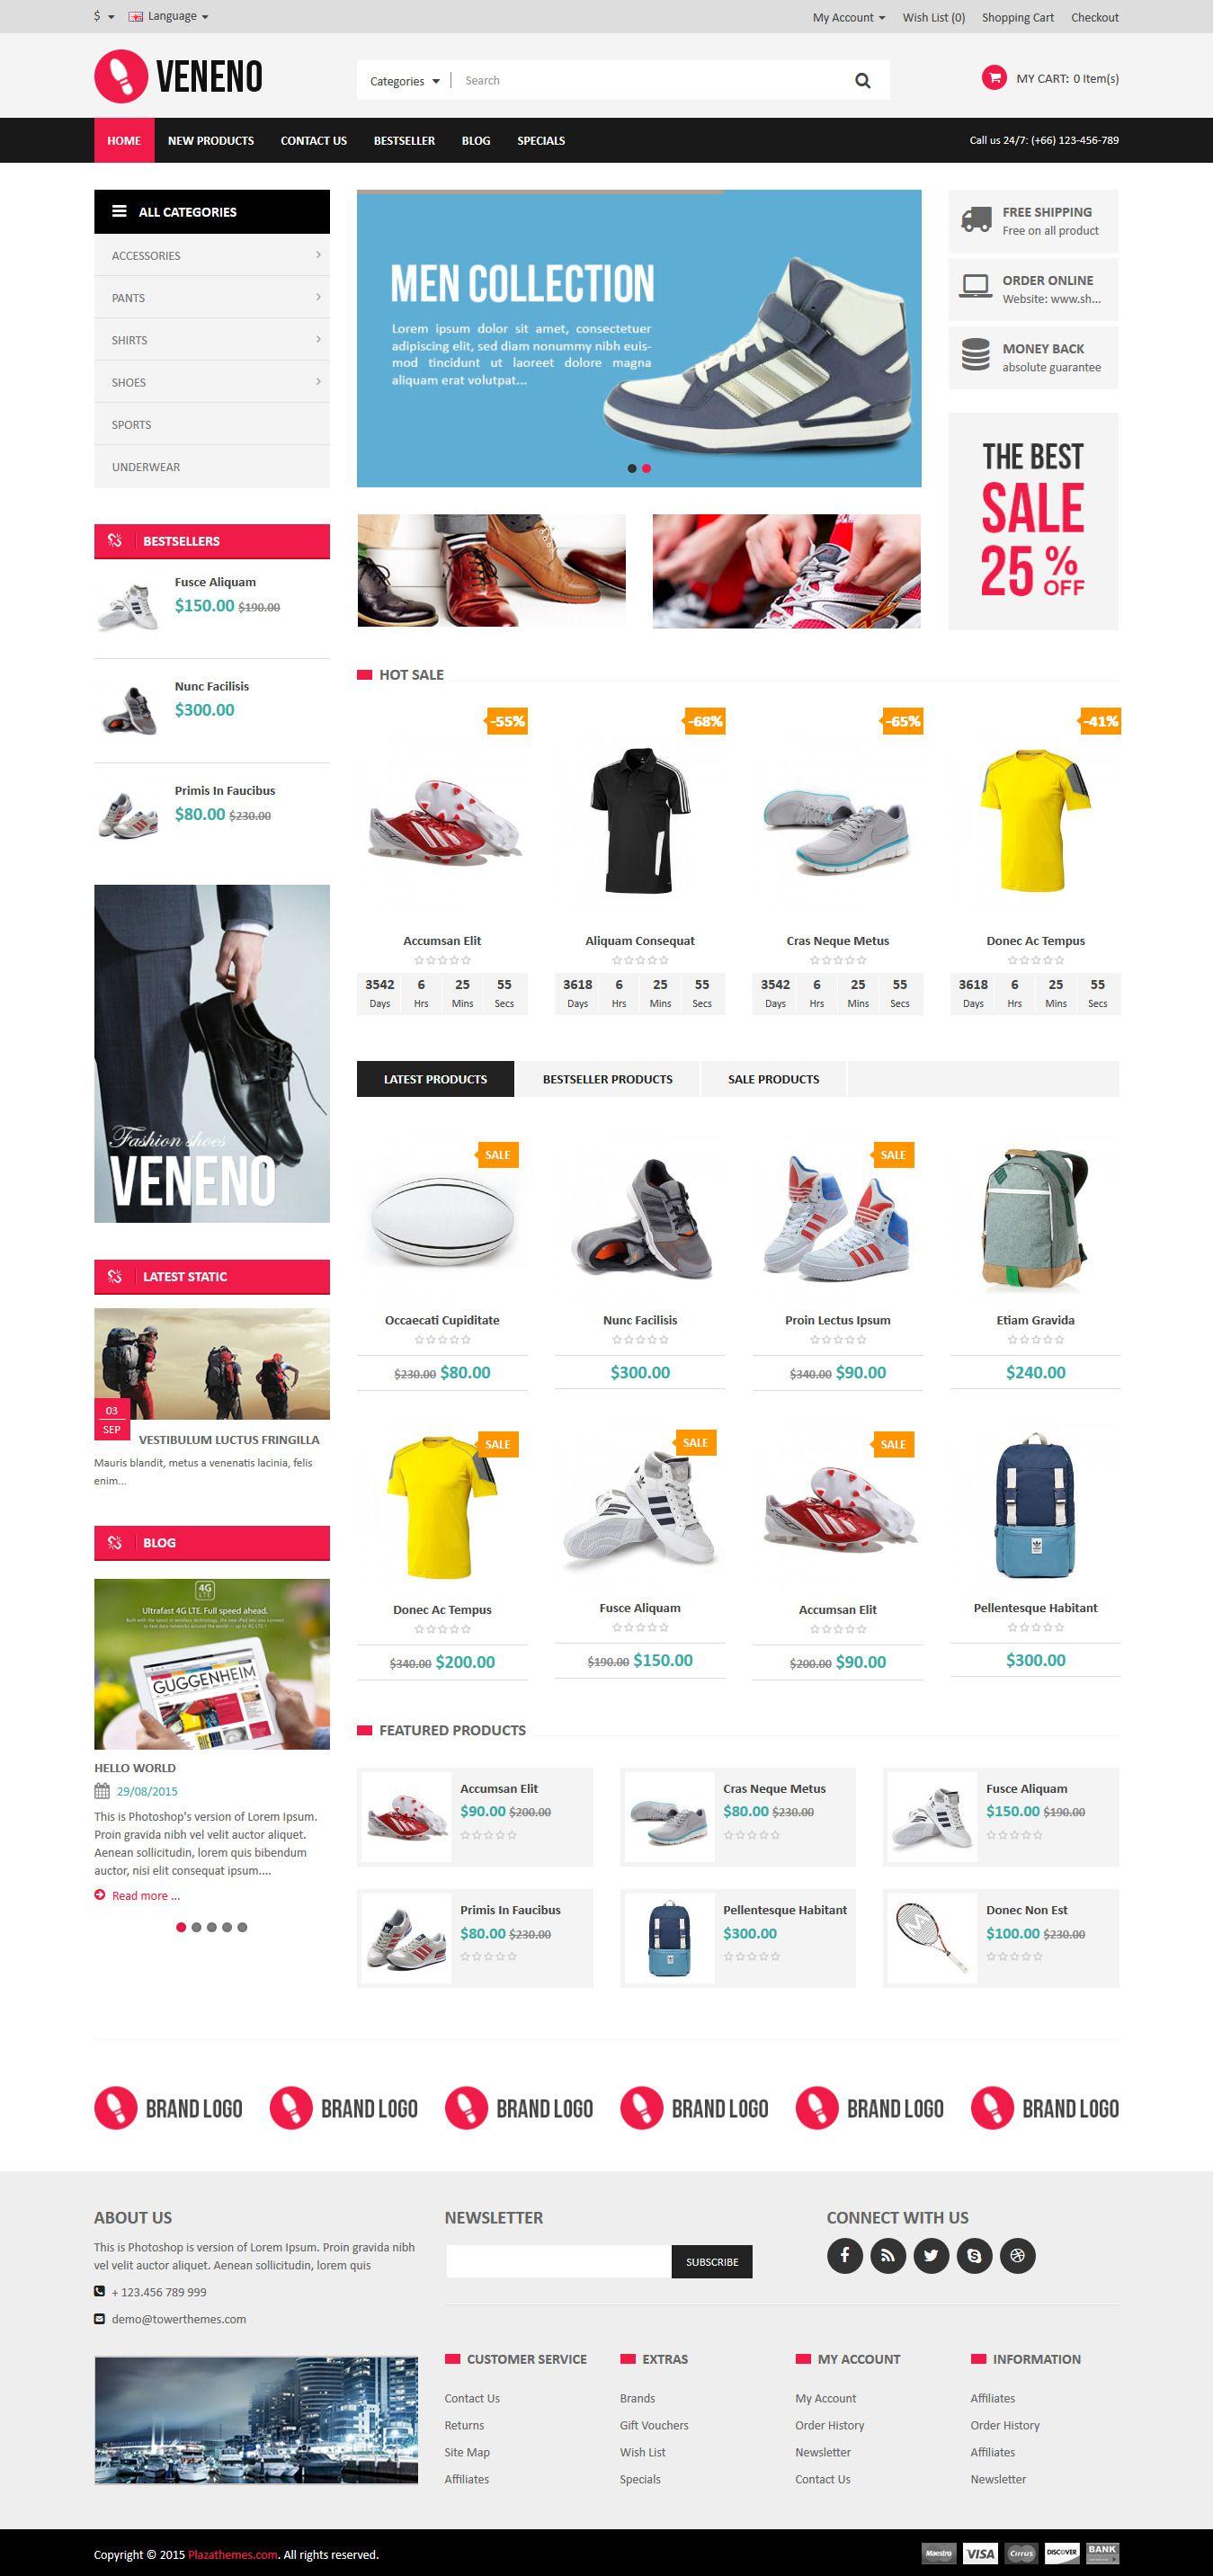 Veneno - Multipurpose Responsive OpenCart Theme Demo 1 #ecommerce #website Download: http://themeforest.net/item/veneno-multipurpose-responsive-opencart-theme/12867654?ref=ksioks